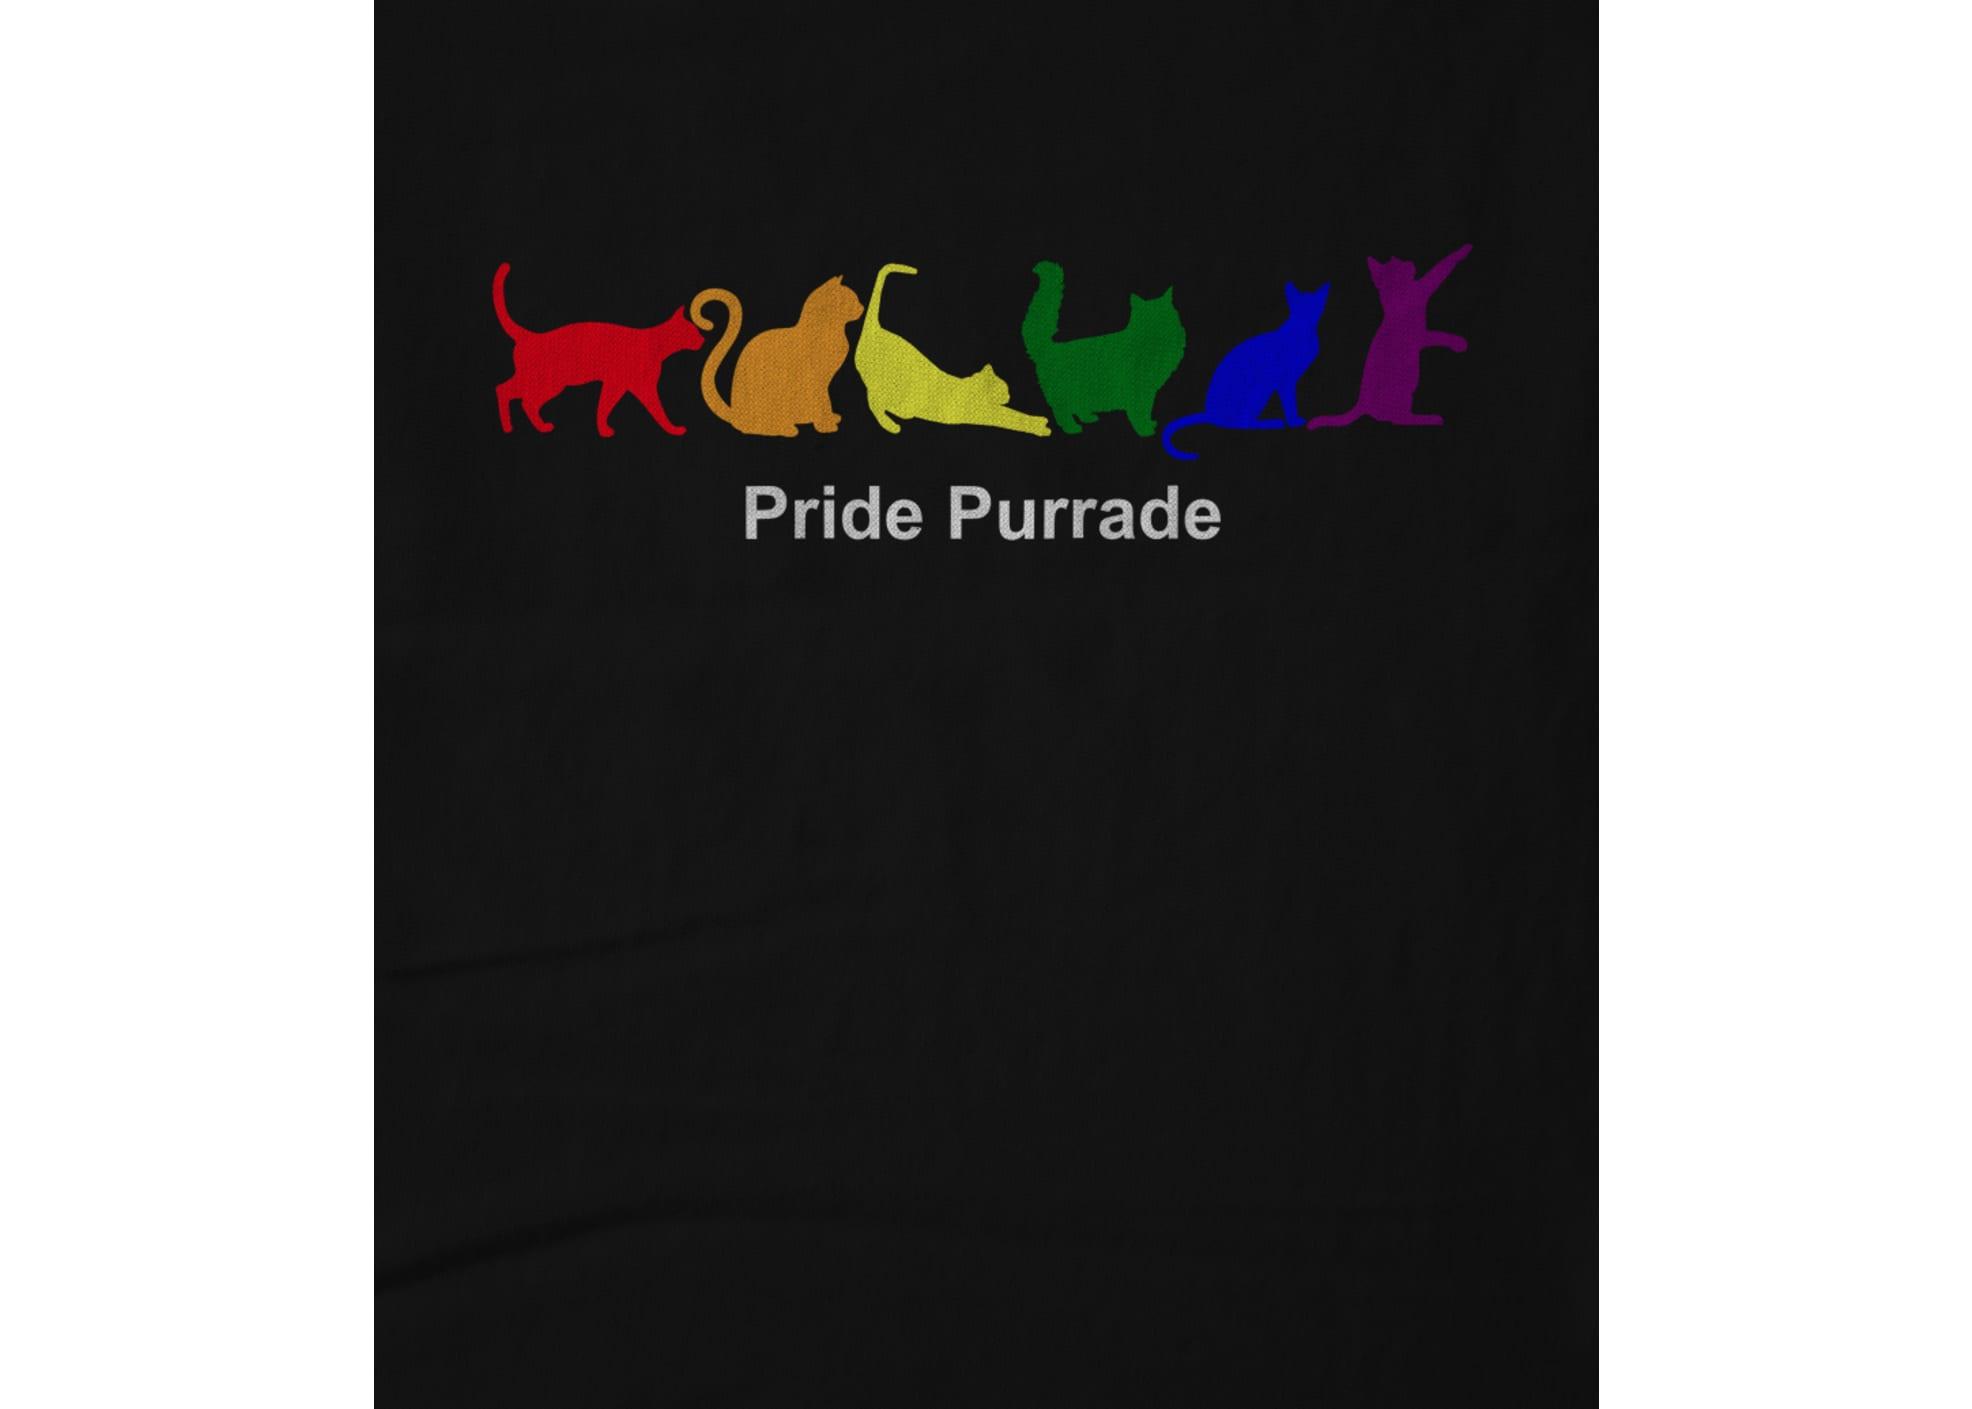 Tacostabber pride purrade 1624119481